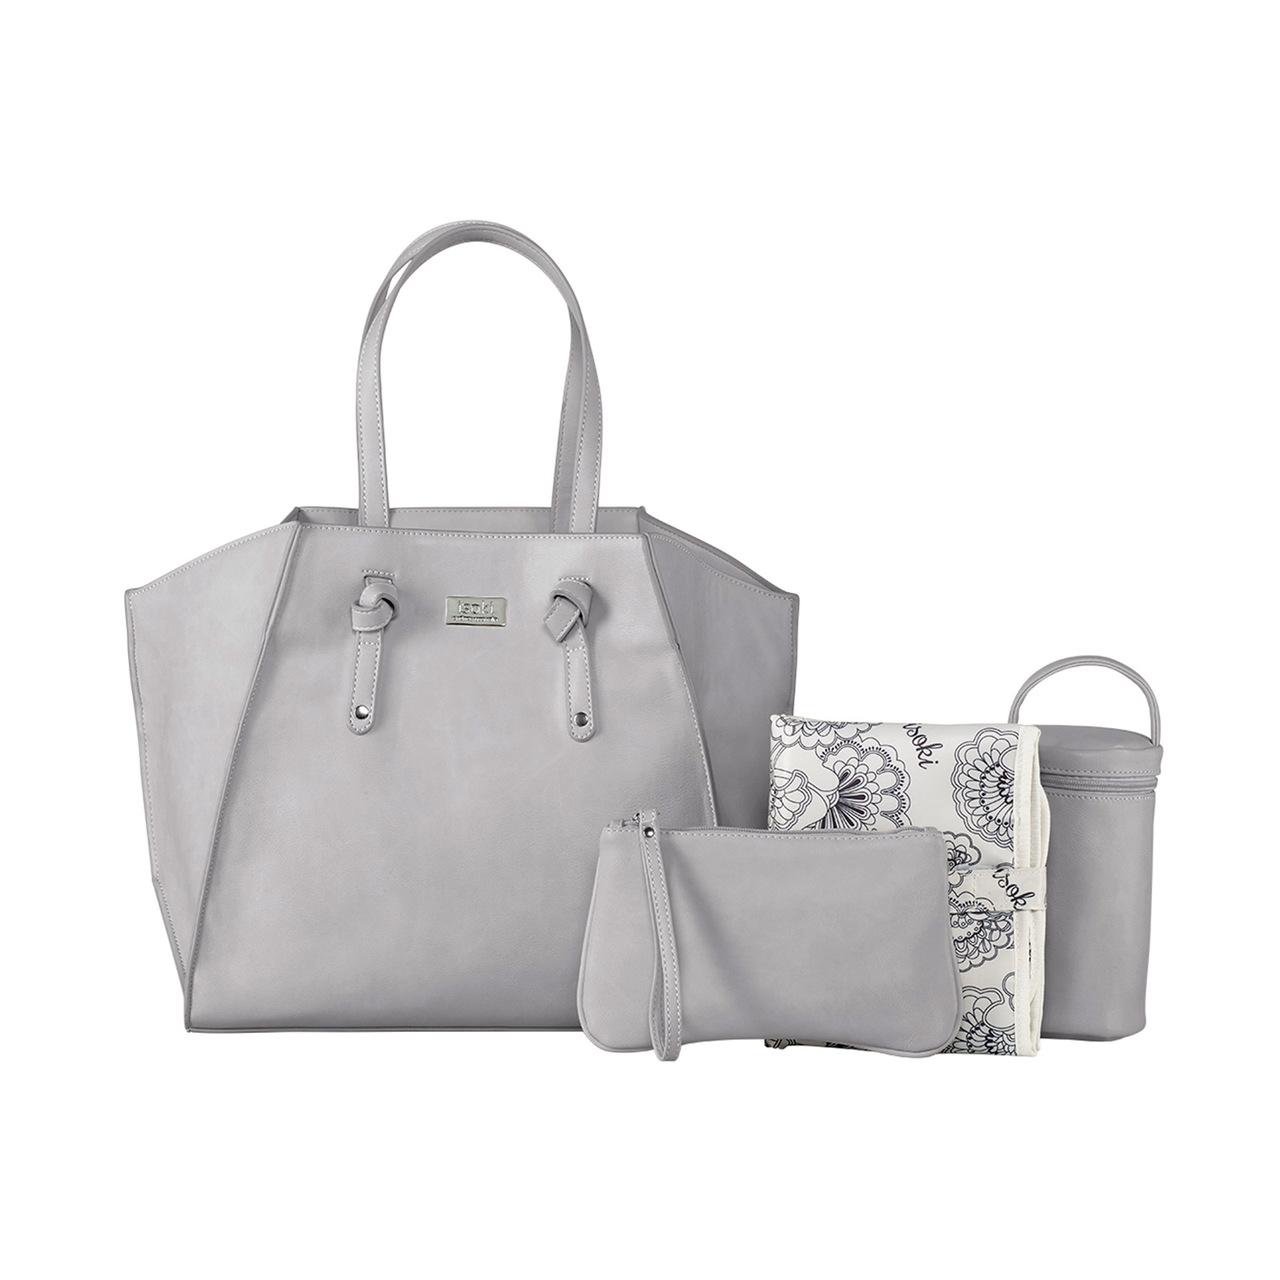 c07ce0ca6c32 Nappy Bags   Buy Designer Nappy Bags Online Australia